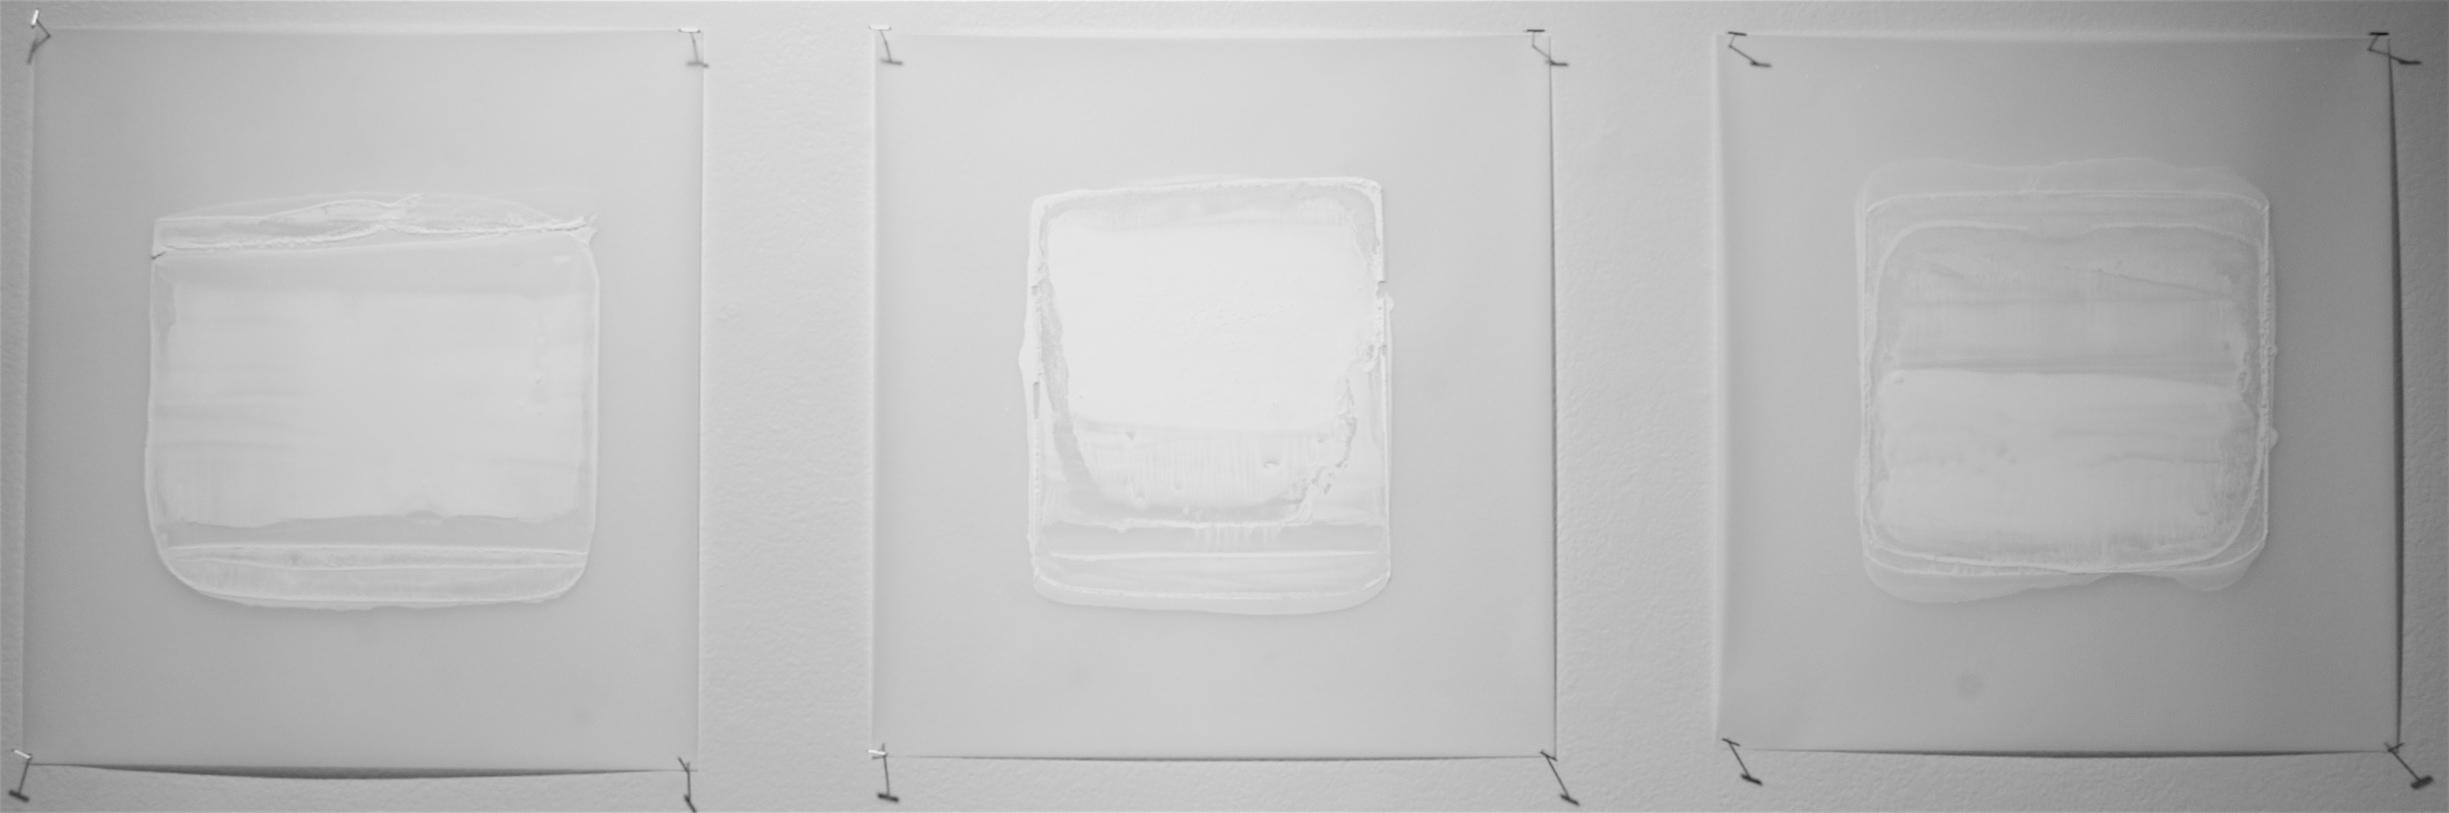 Untitled (White) 74952, 74953, 74954.jpg